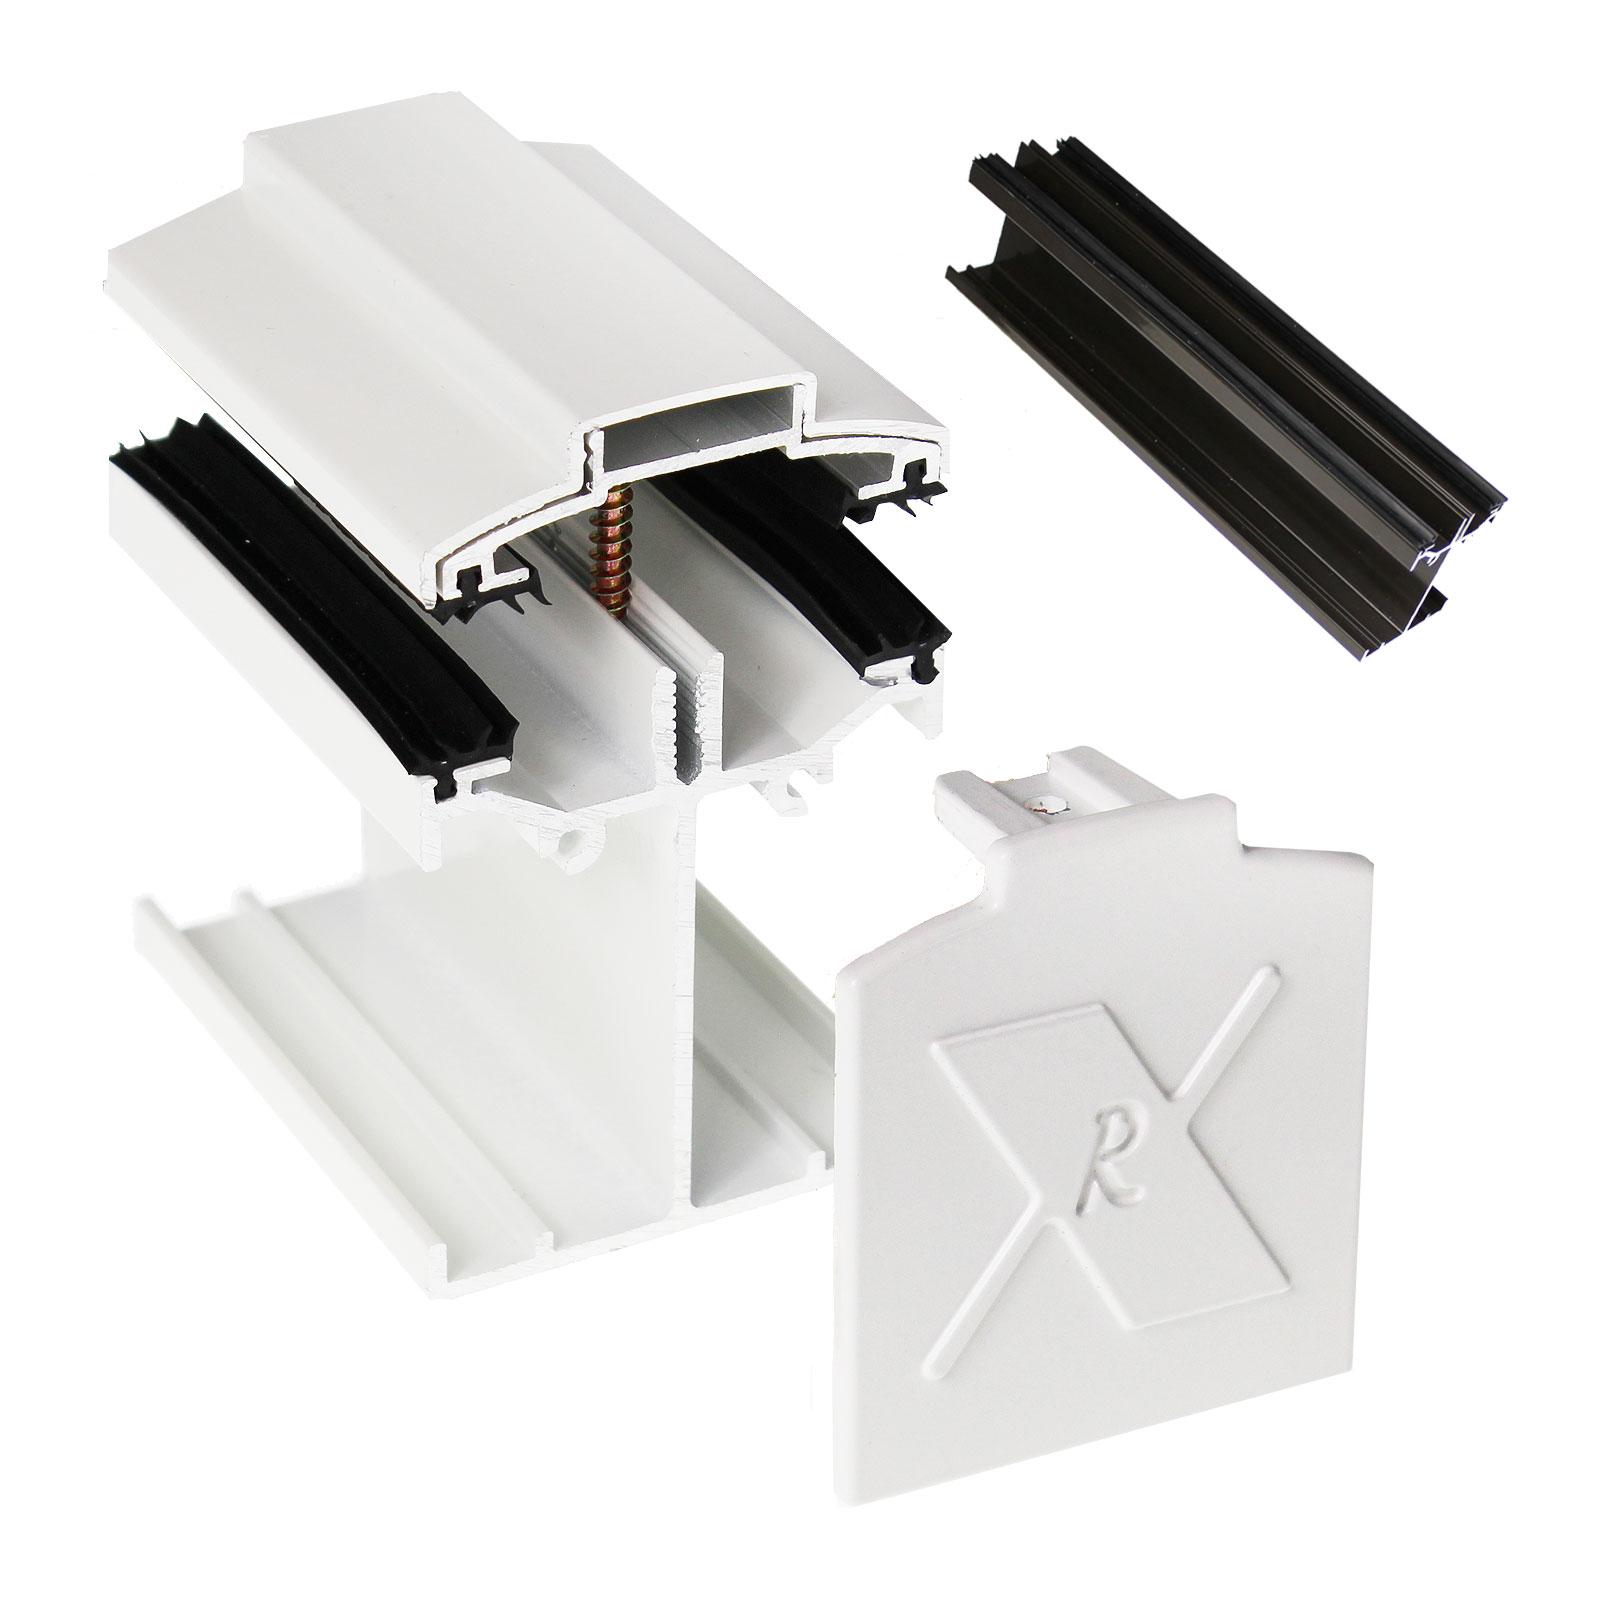 Alukap Ss Low Profile Main Bar Truly Pvc Supplies